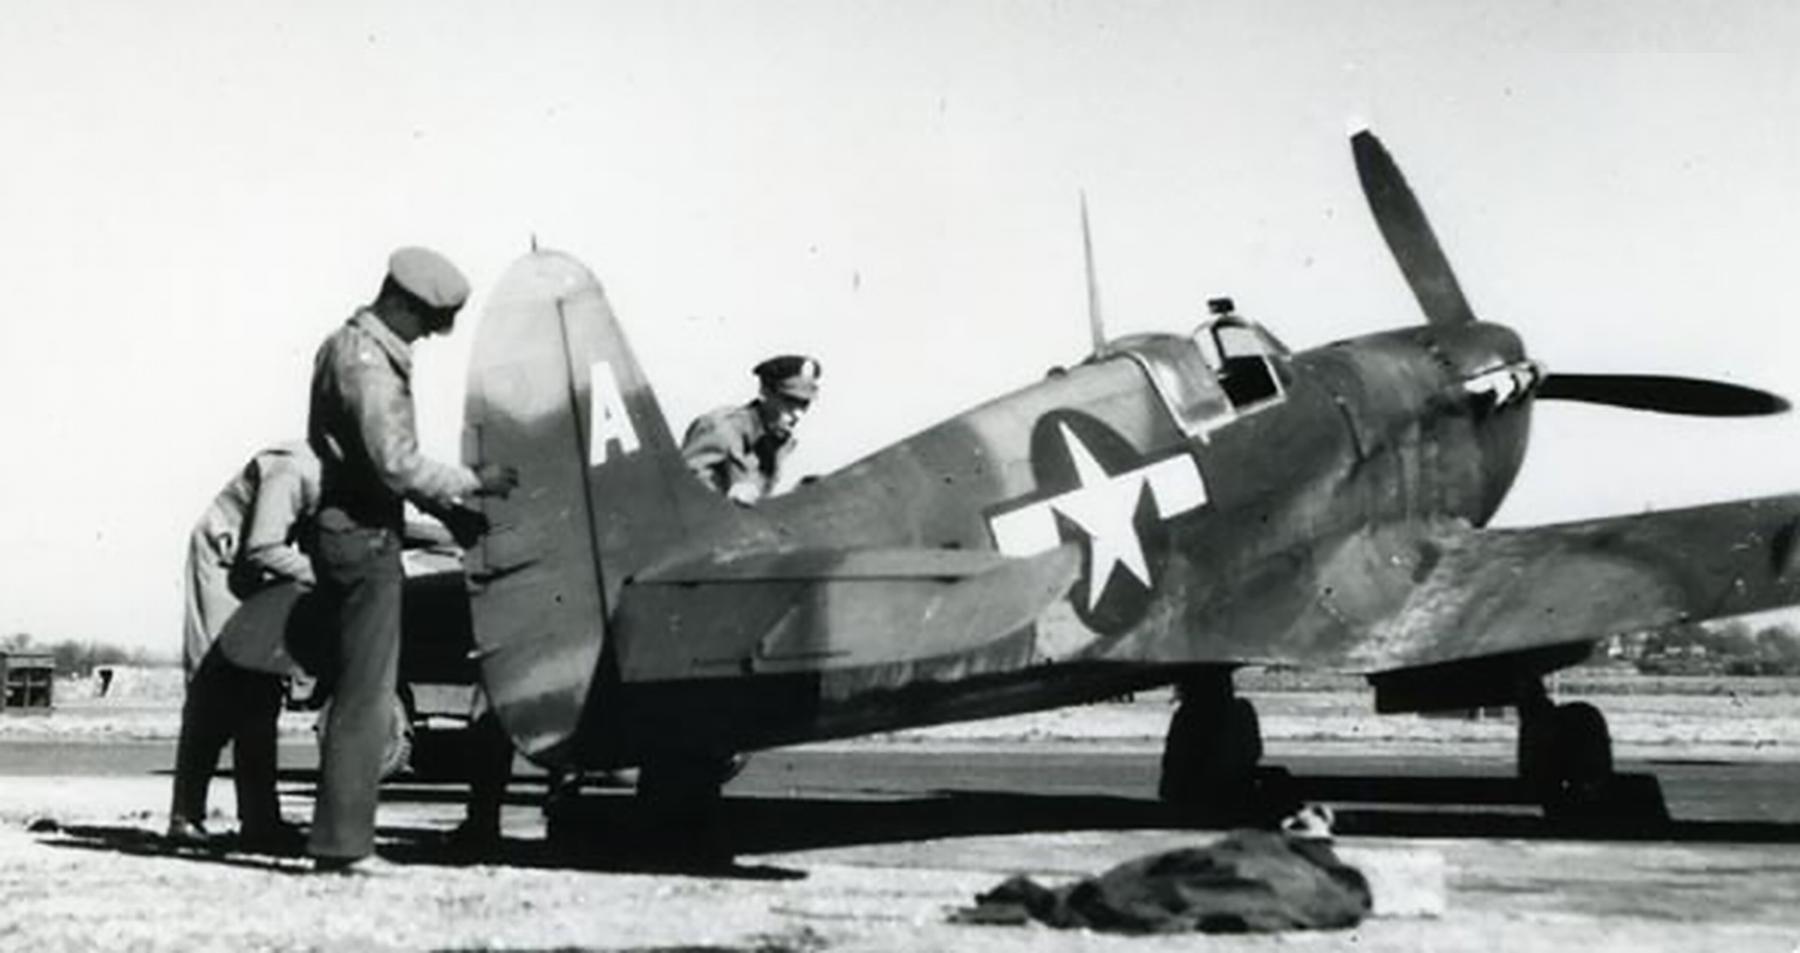 Spitfire LFVb USAAF 7PRG14PS A BL680 Oxfordshire England Nov 1943 02